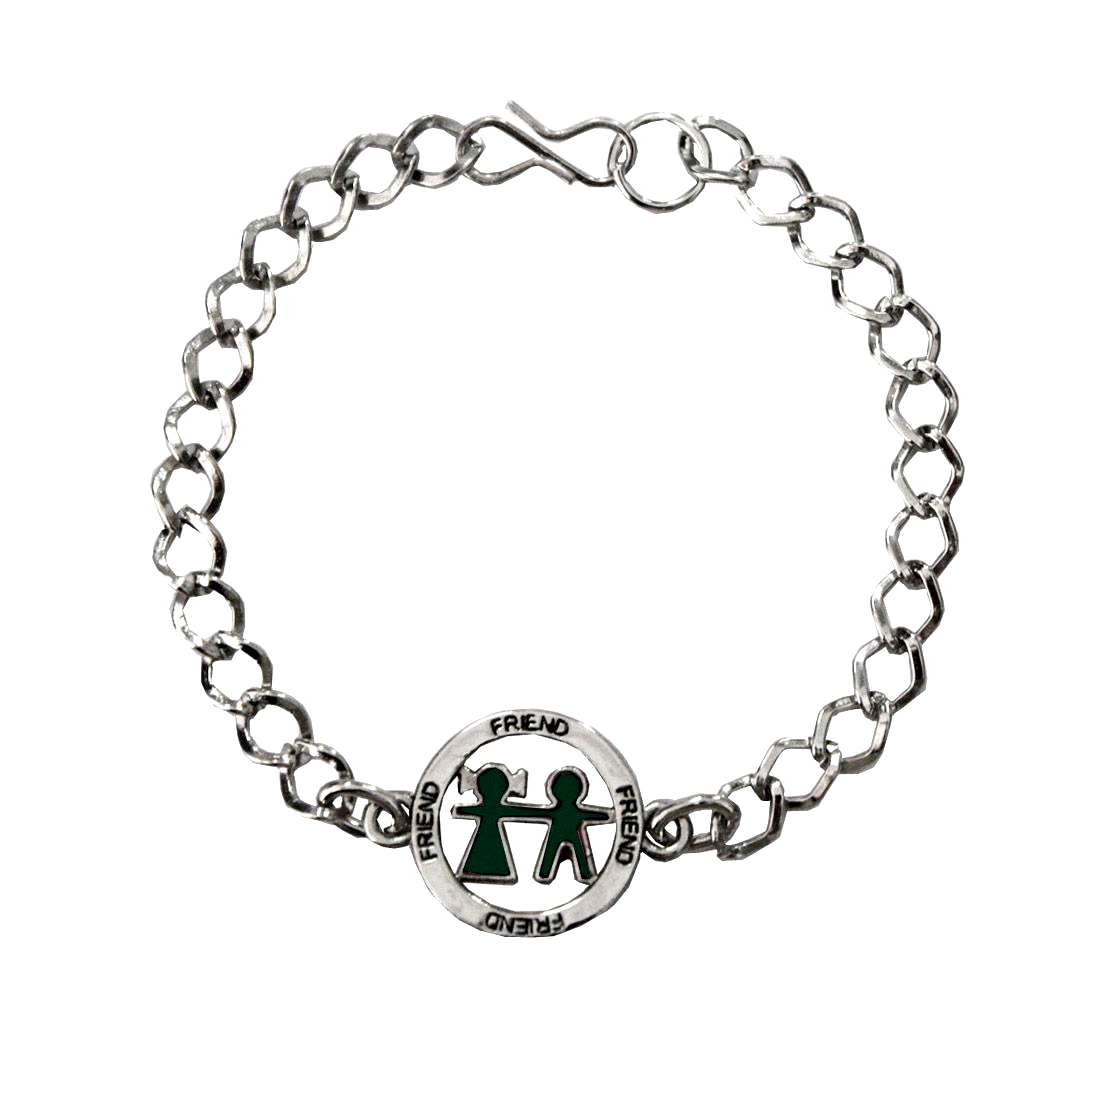 double wave friendship bracelet pattern, chevron